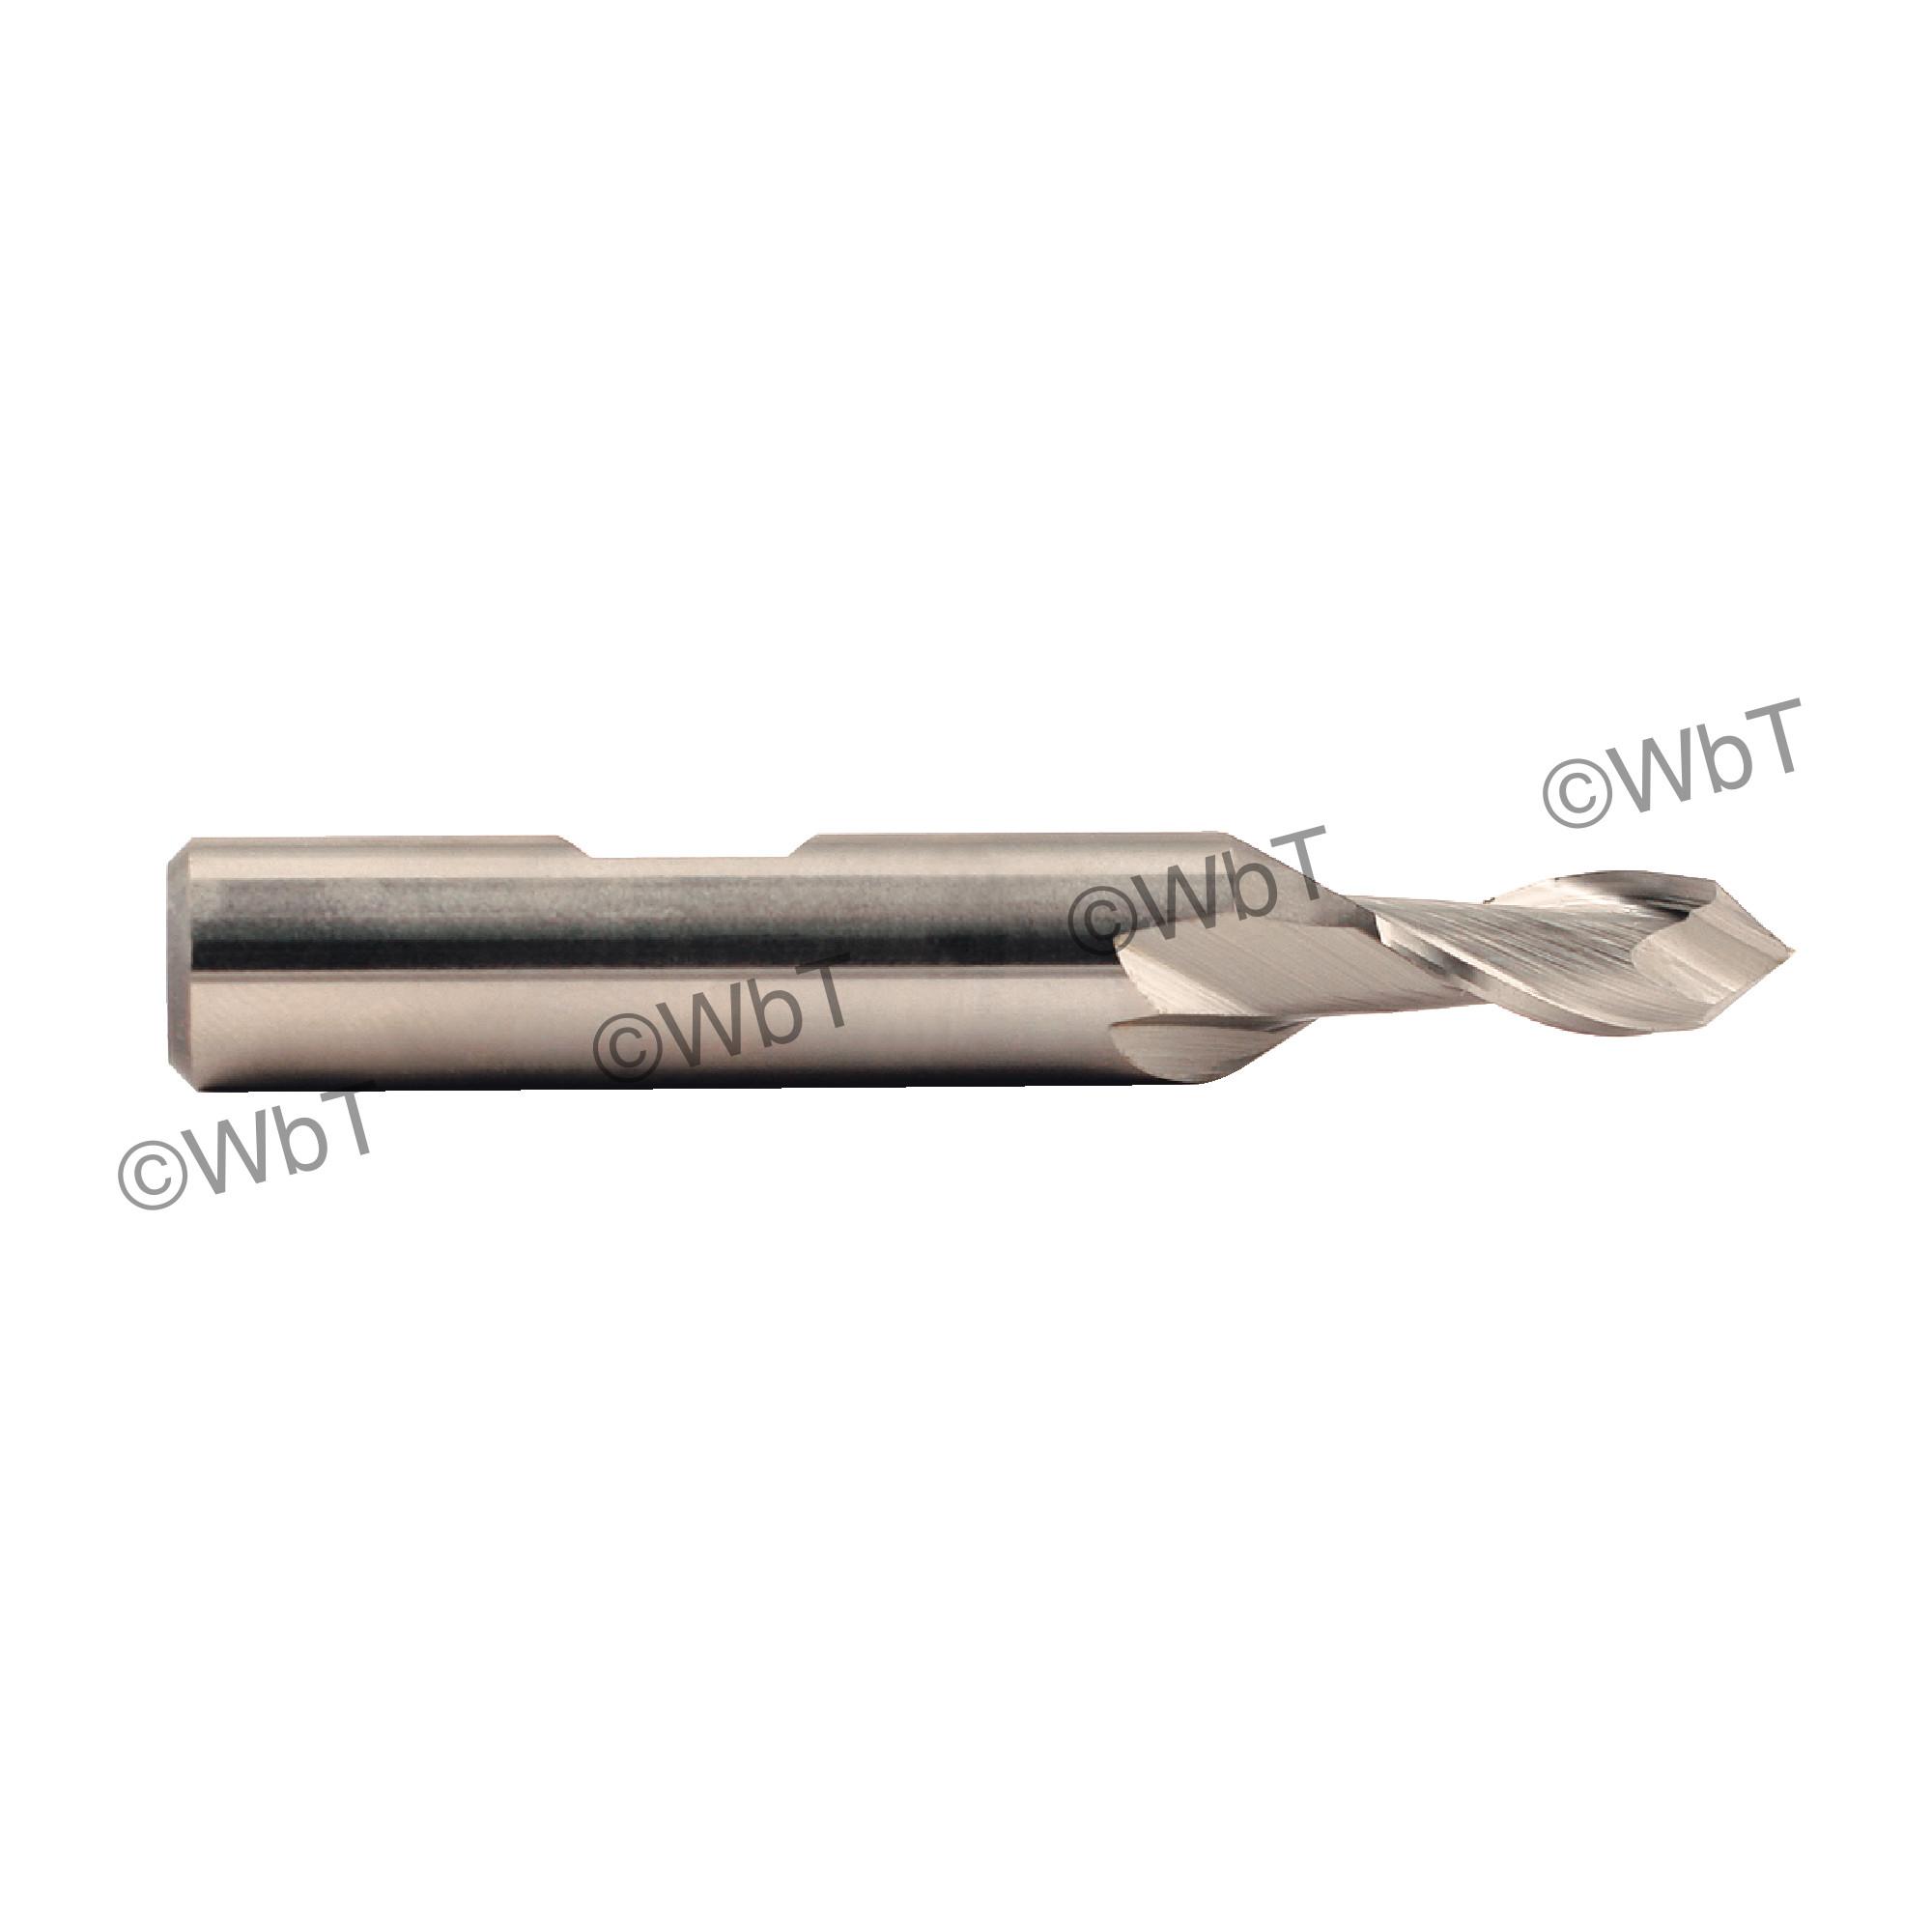 "1/4"" x 90° Cobalt 2 Flute Drill-Mill Single End Mill"